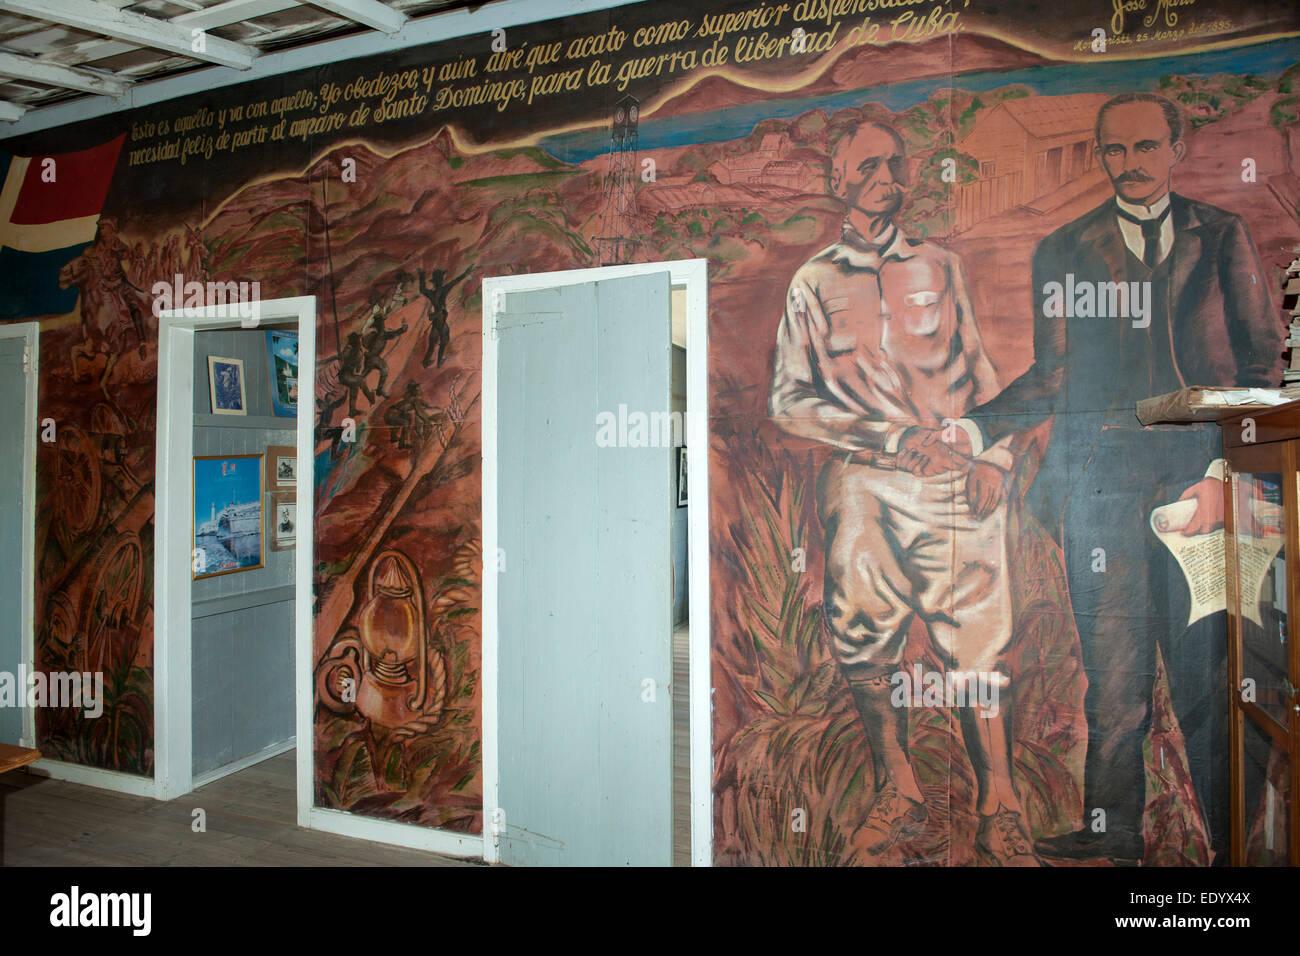 Dominikanische Republik, Nordküste, Monte Christi, Museo Maximo Gomez - Stock Image